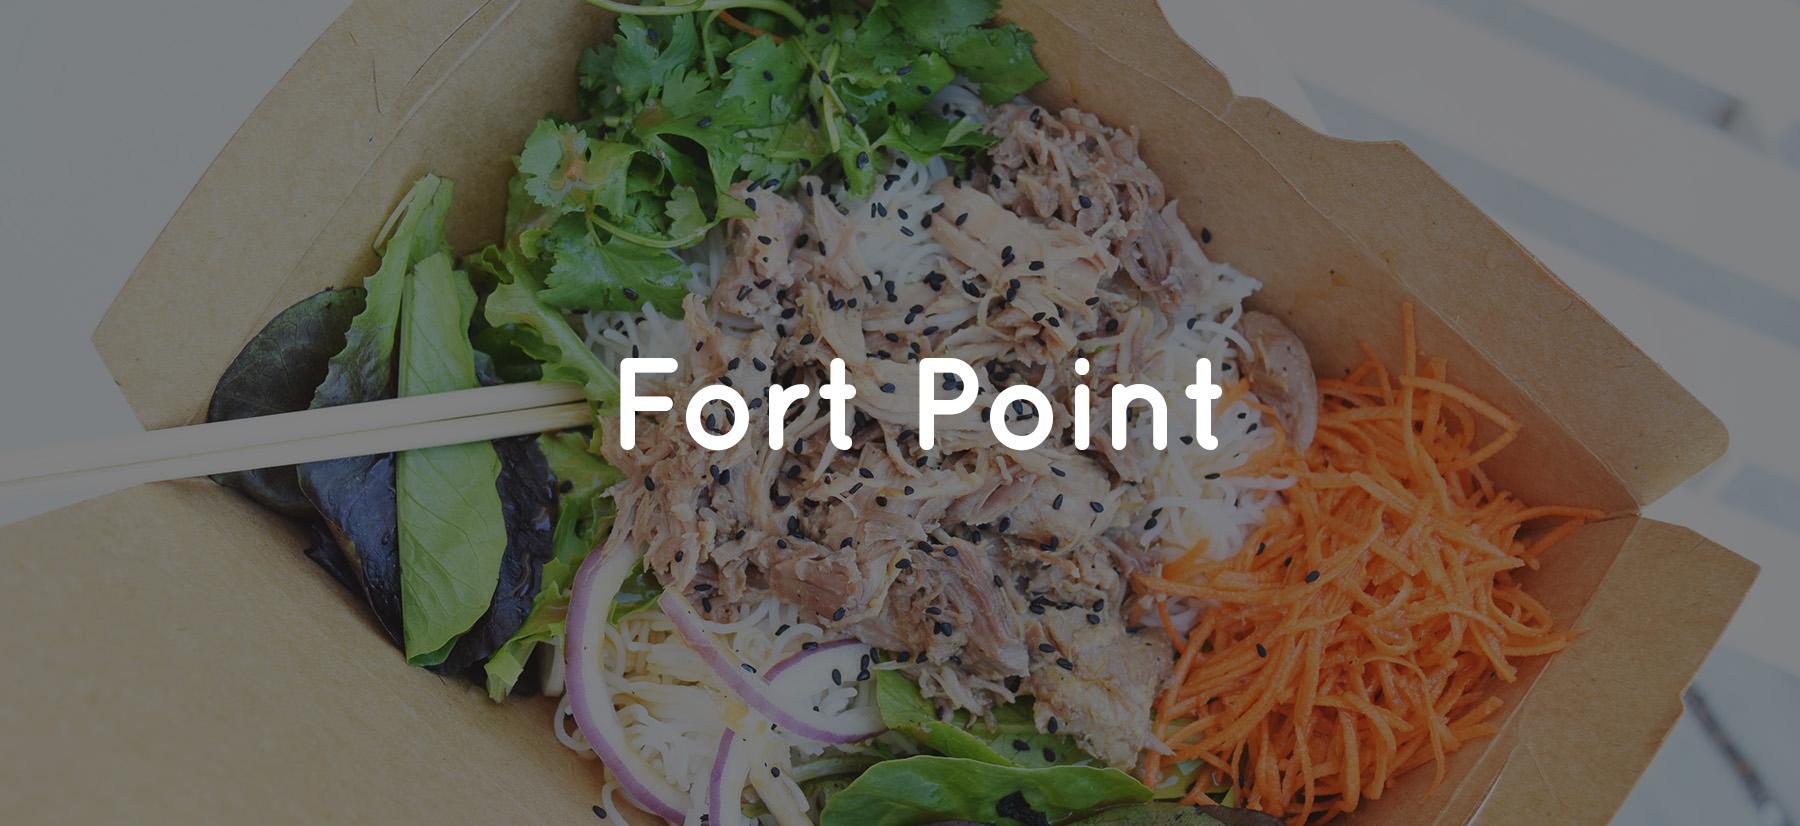 FORT POINT 3.jpg